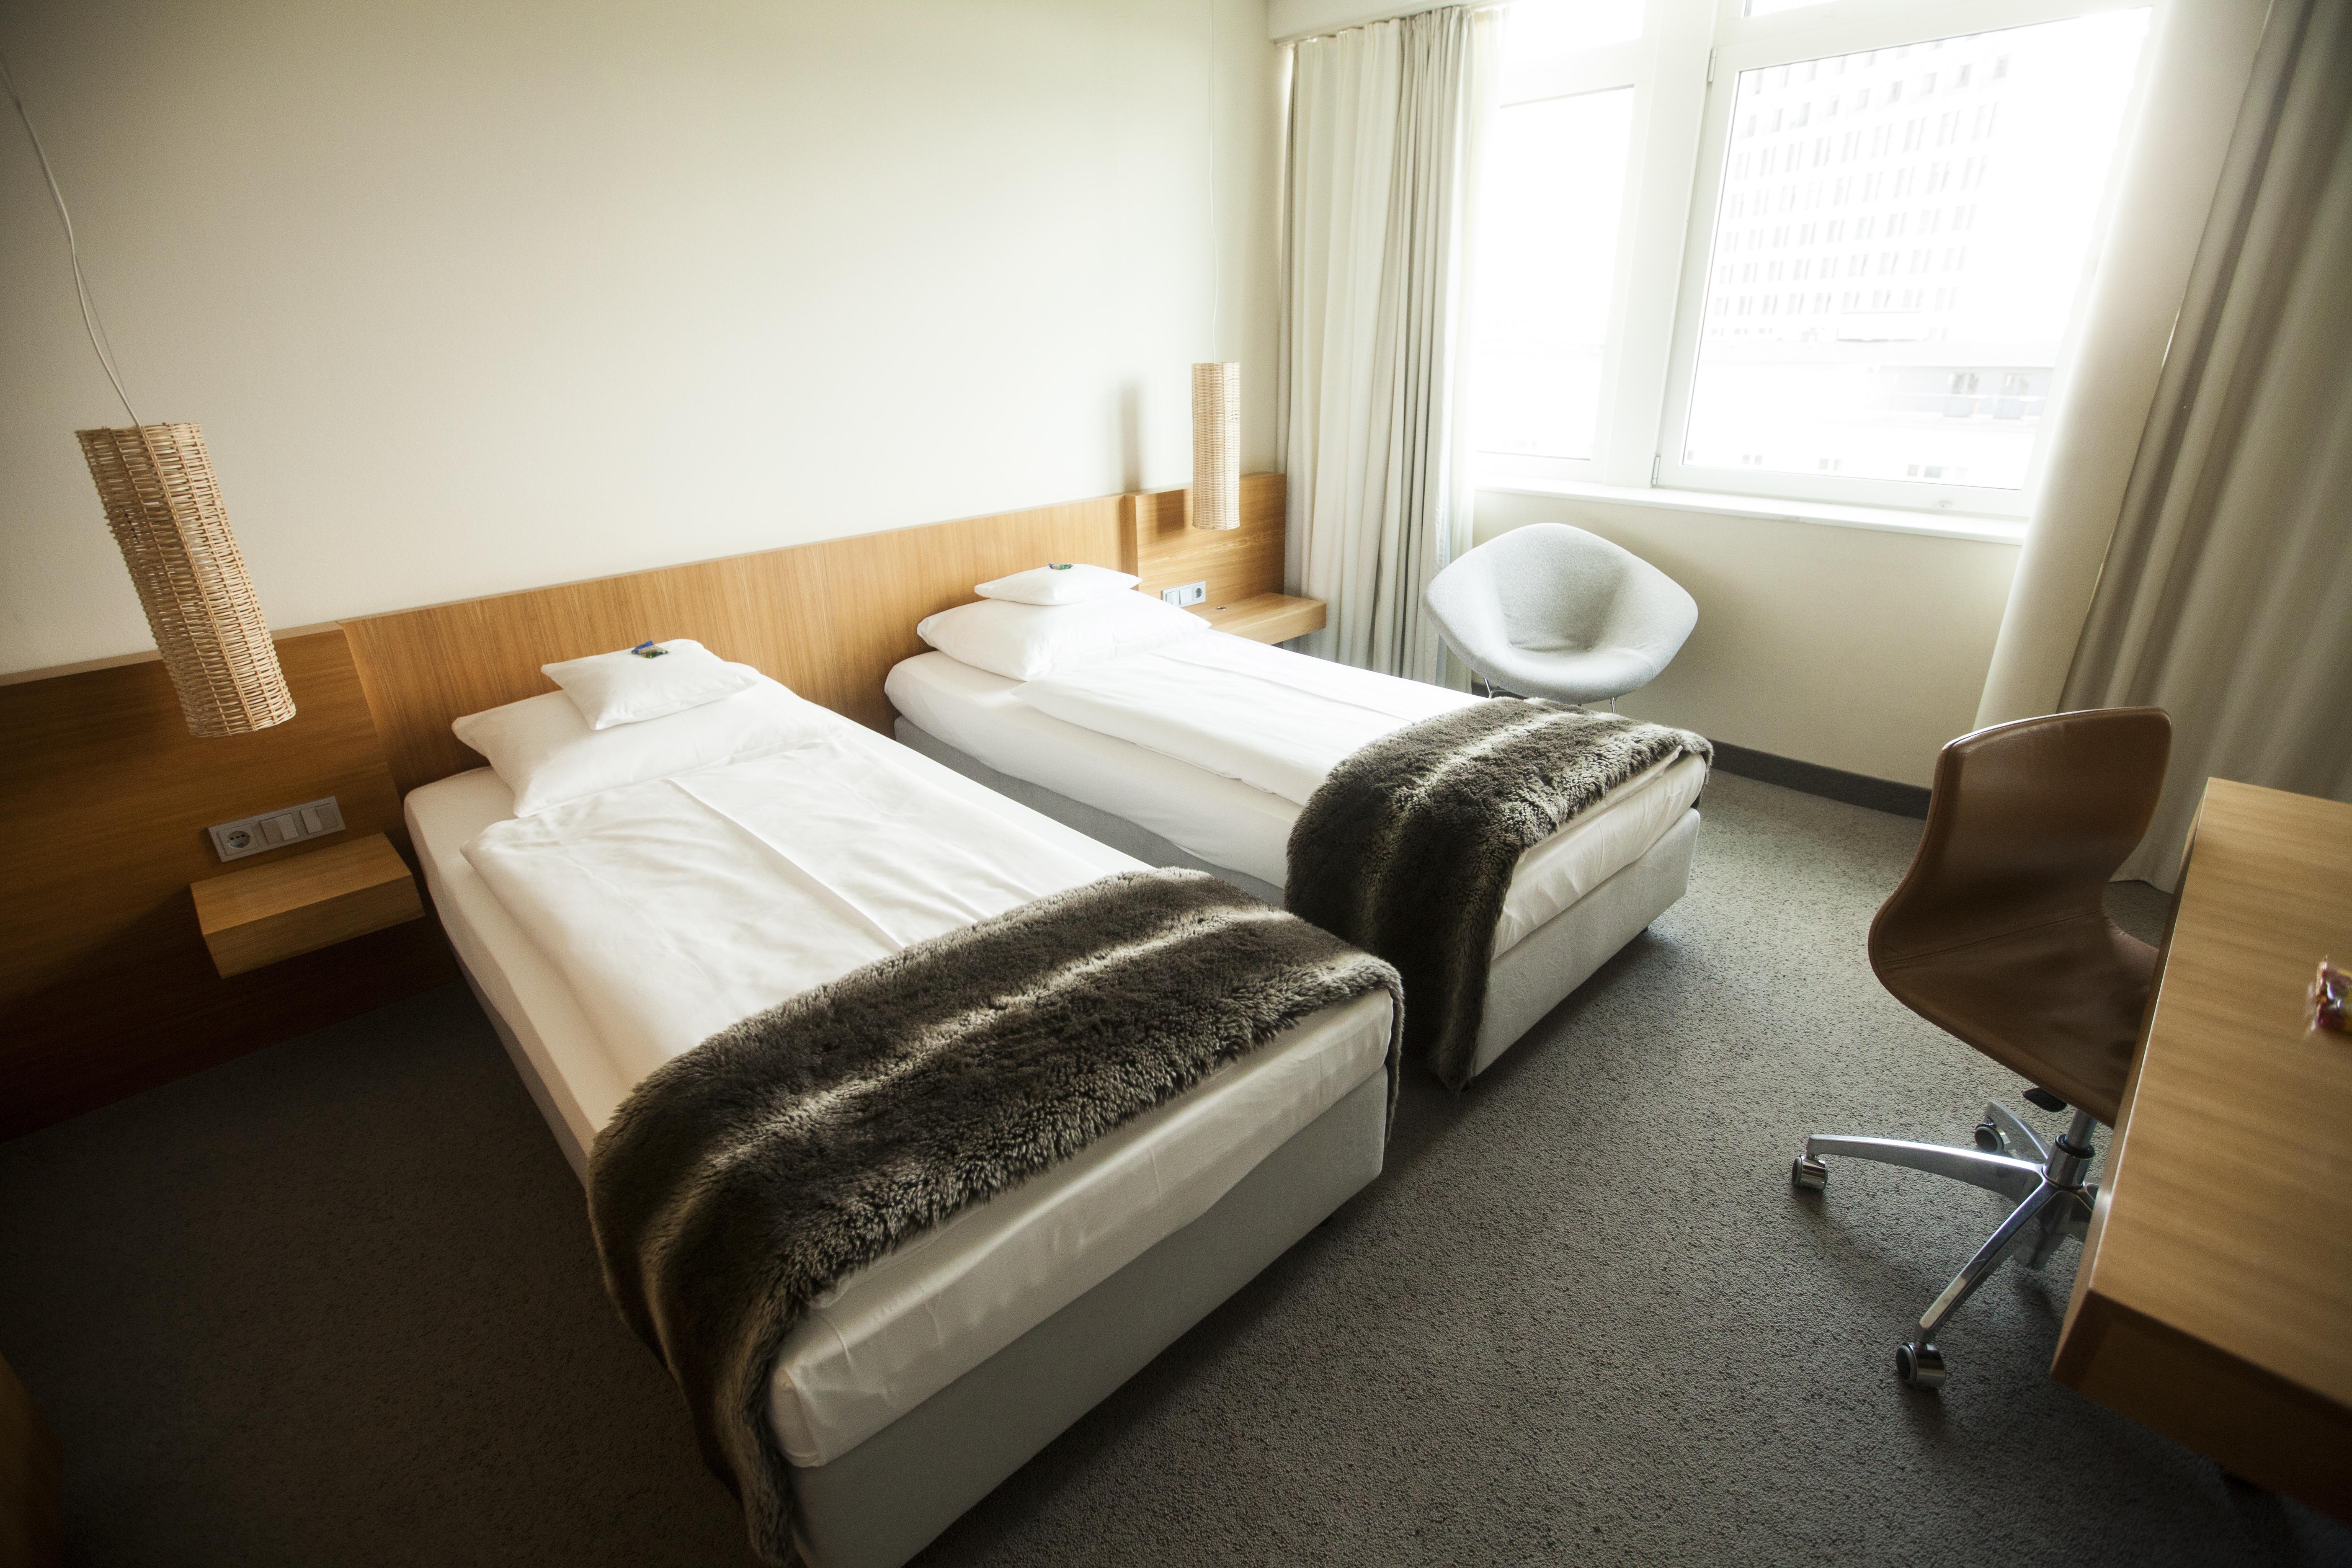 lindner_hotel_vivalamoda_blog_20